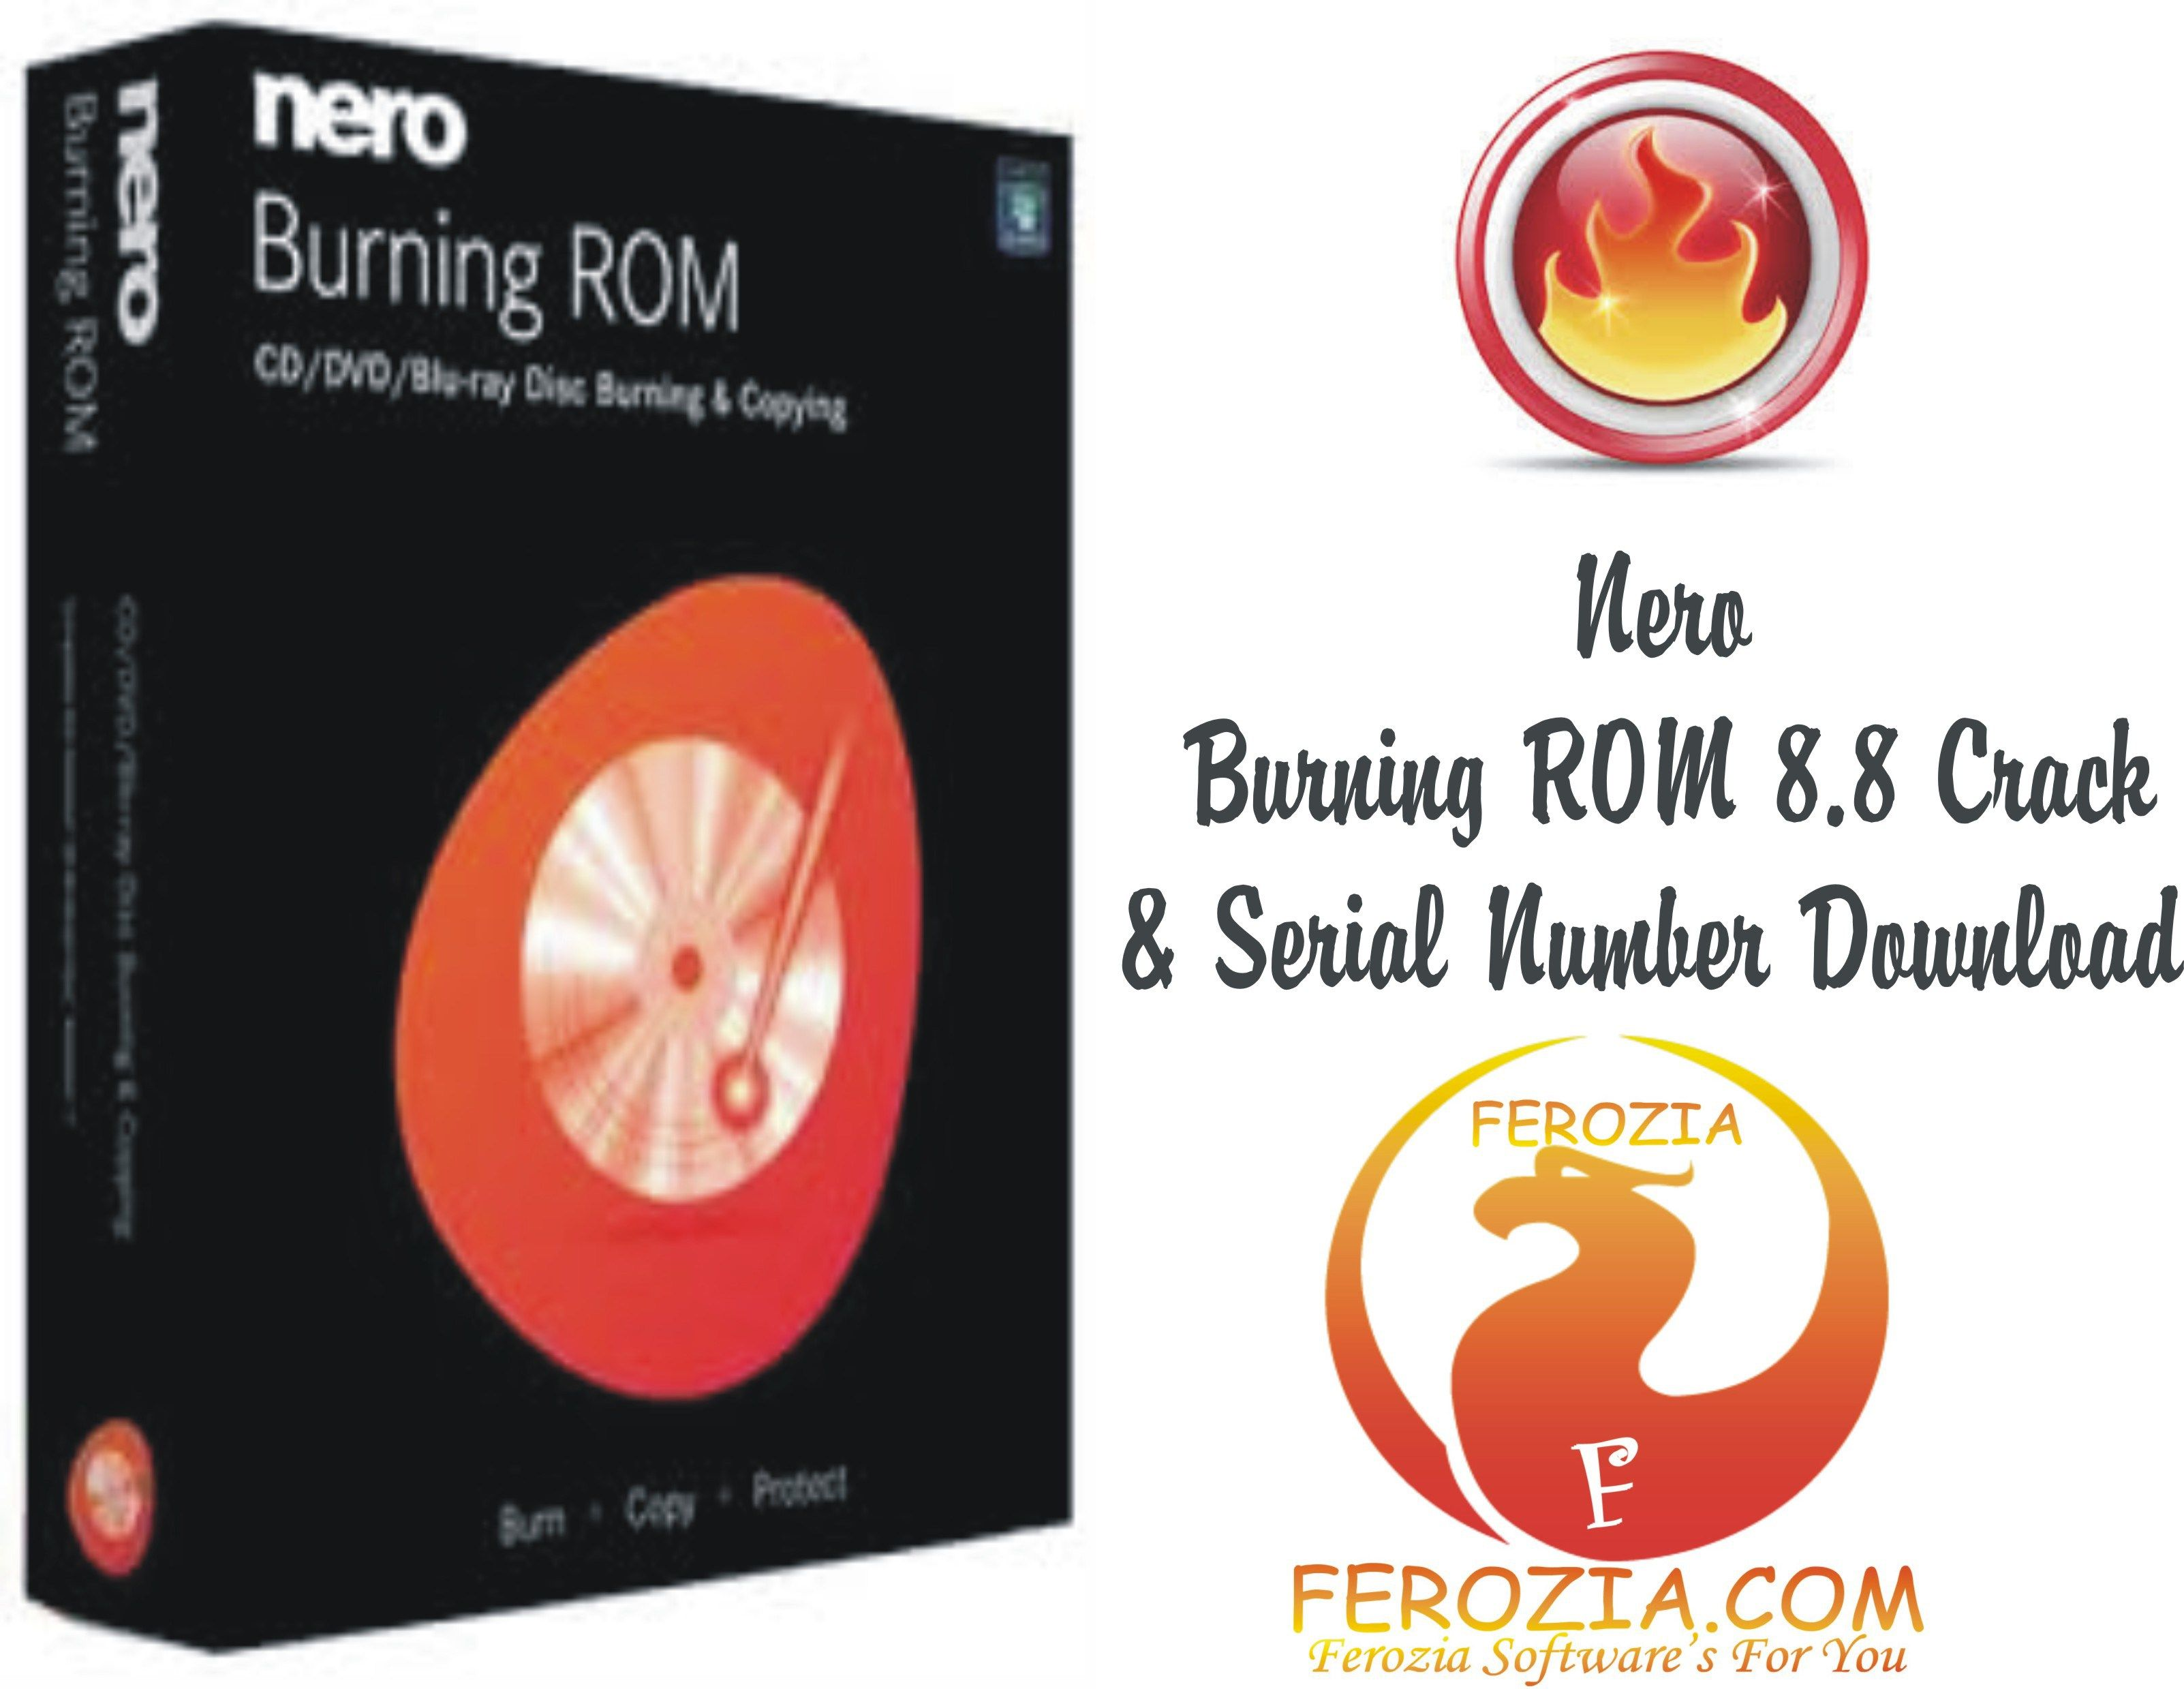 nero burning rom download crack